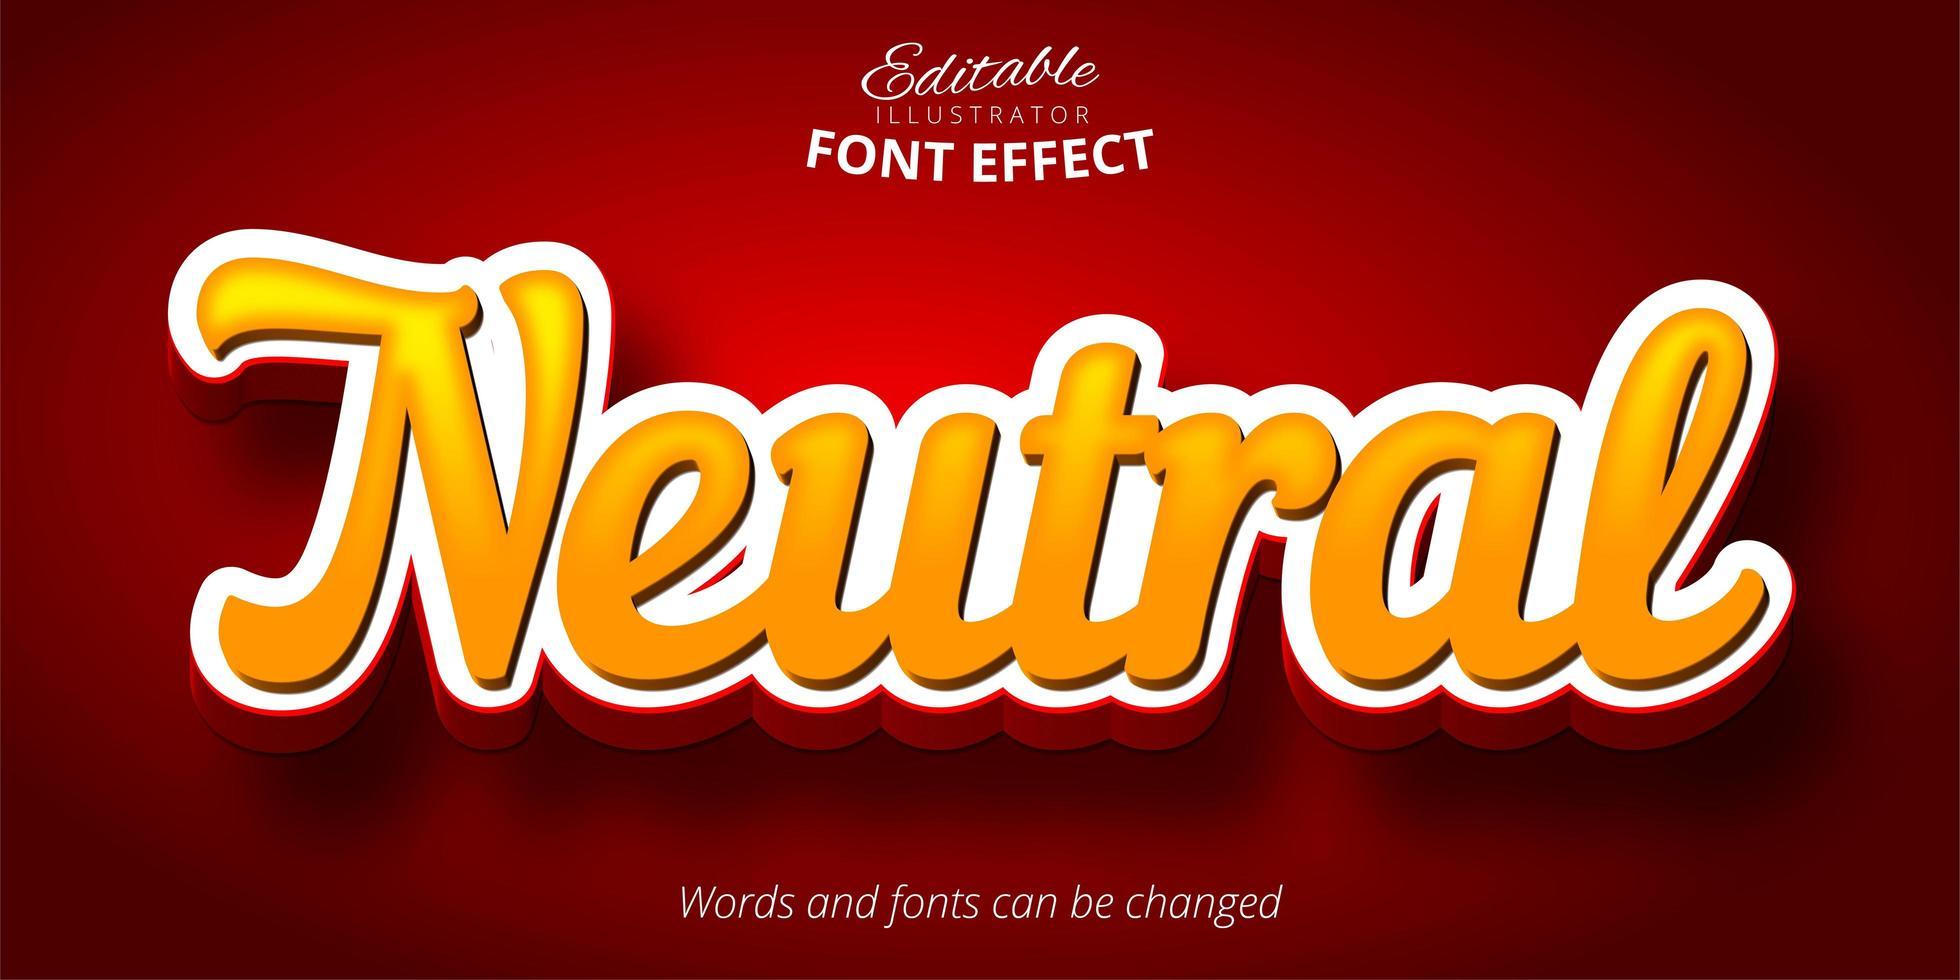 neutrale scripttekst, 3d bewerkbaar lettertype-effect vector